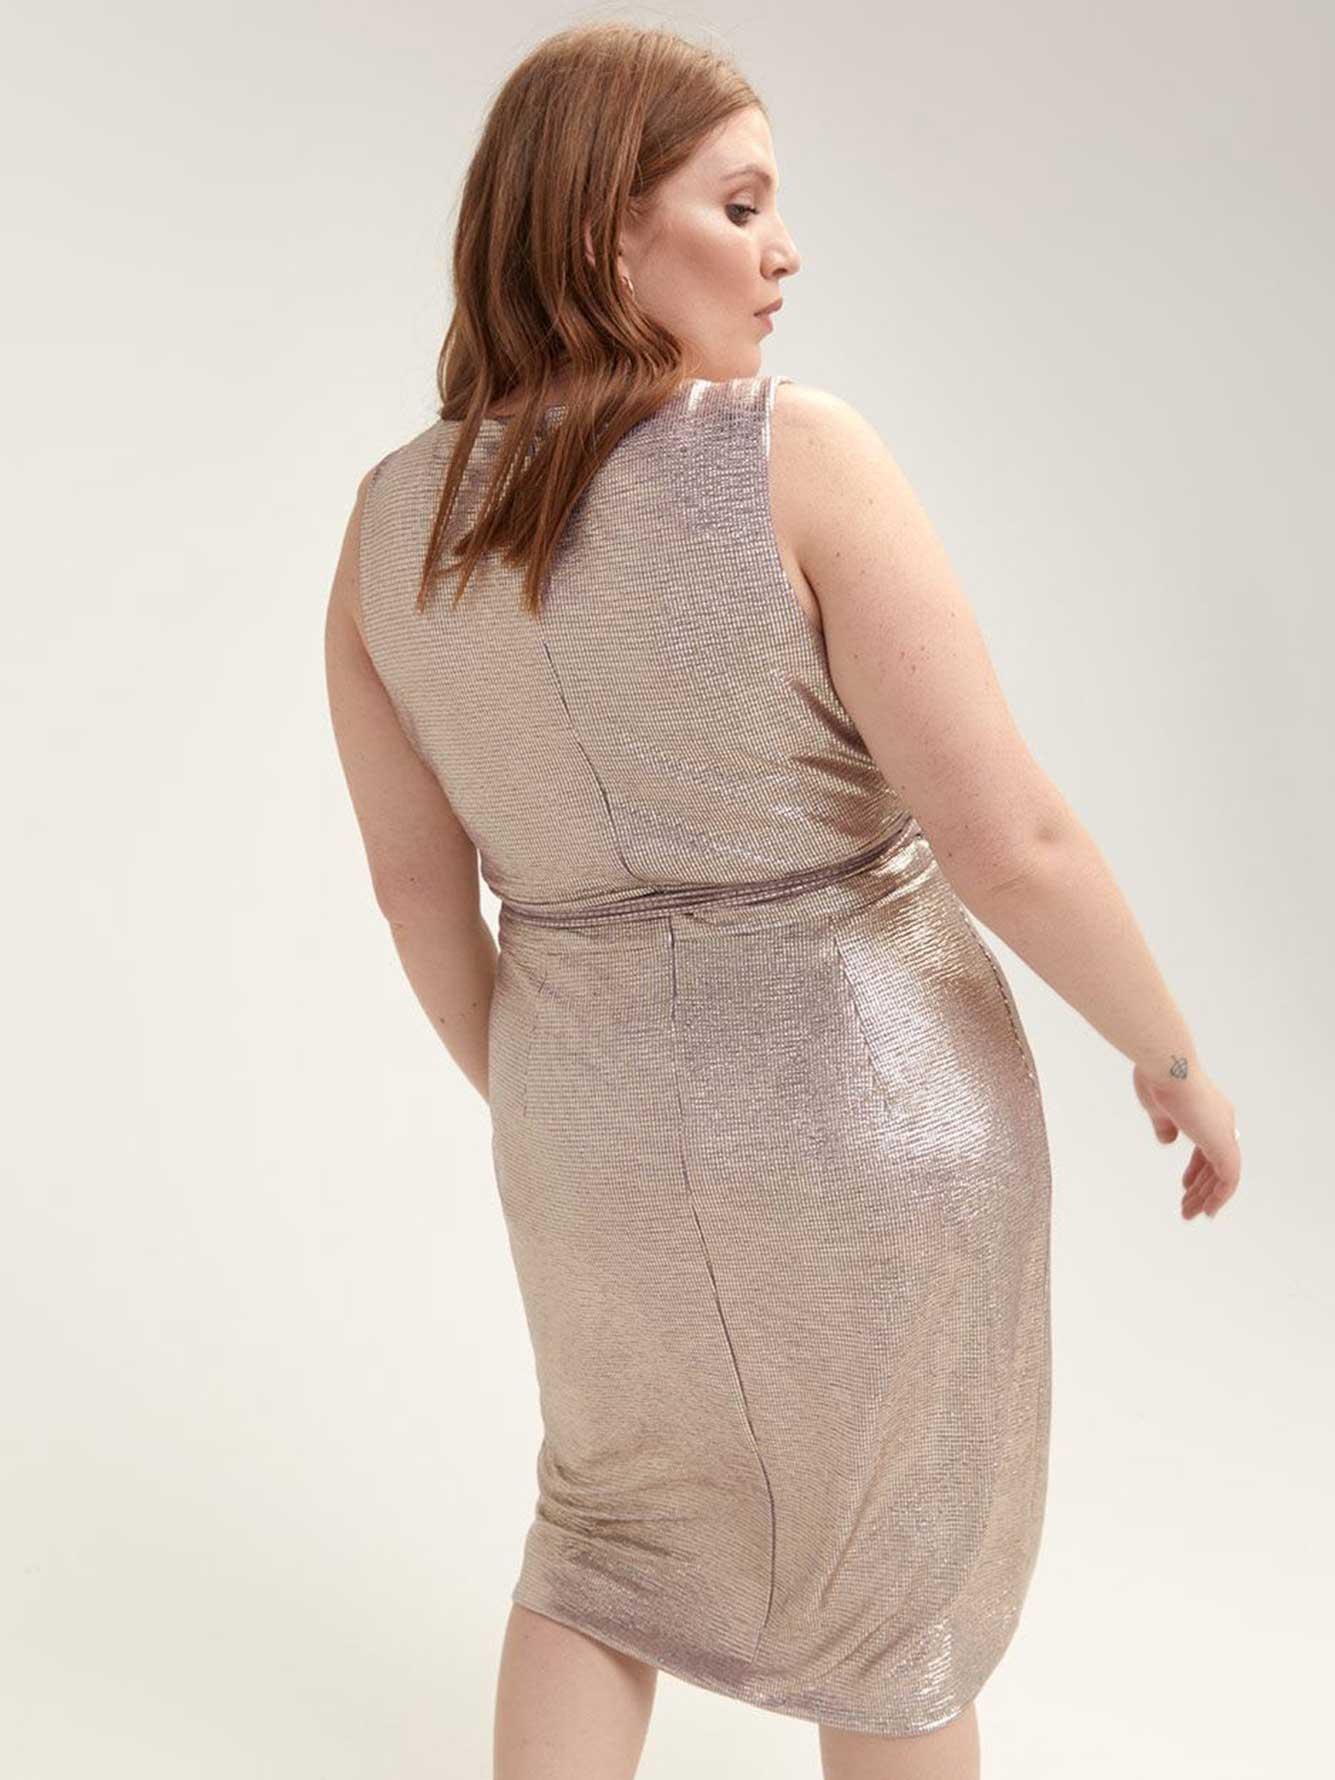 Cross-Front Foil Midi Dress - RACHEL Rachel Roy  5b71cc917